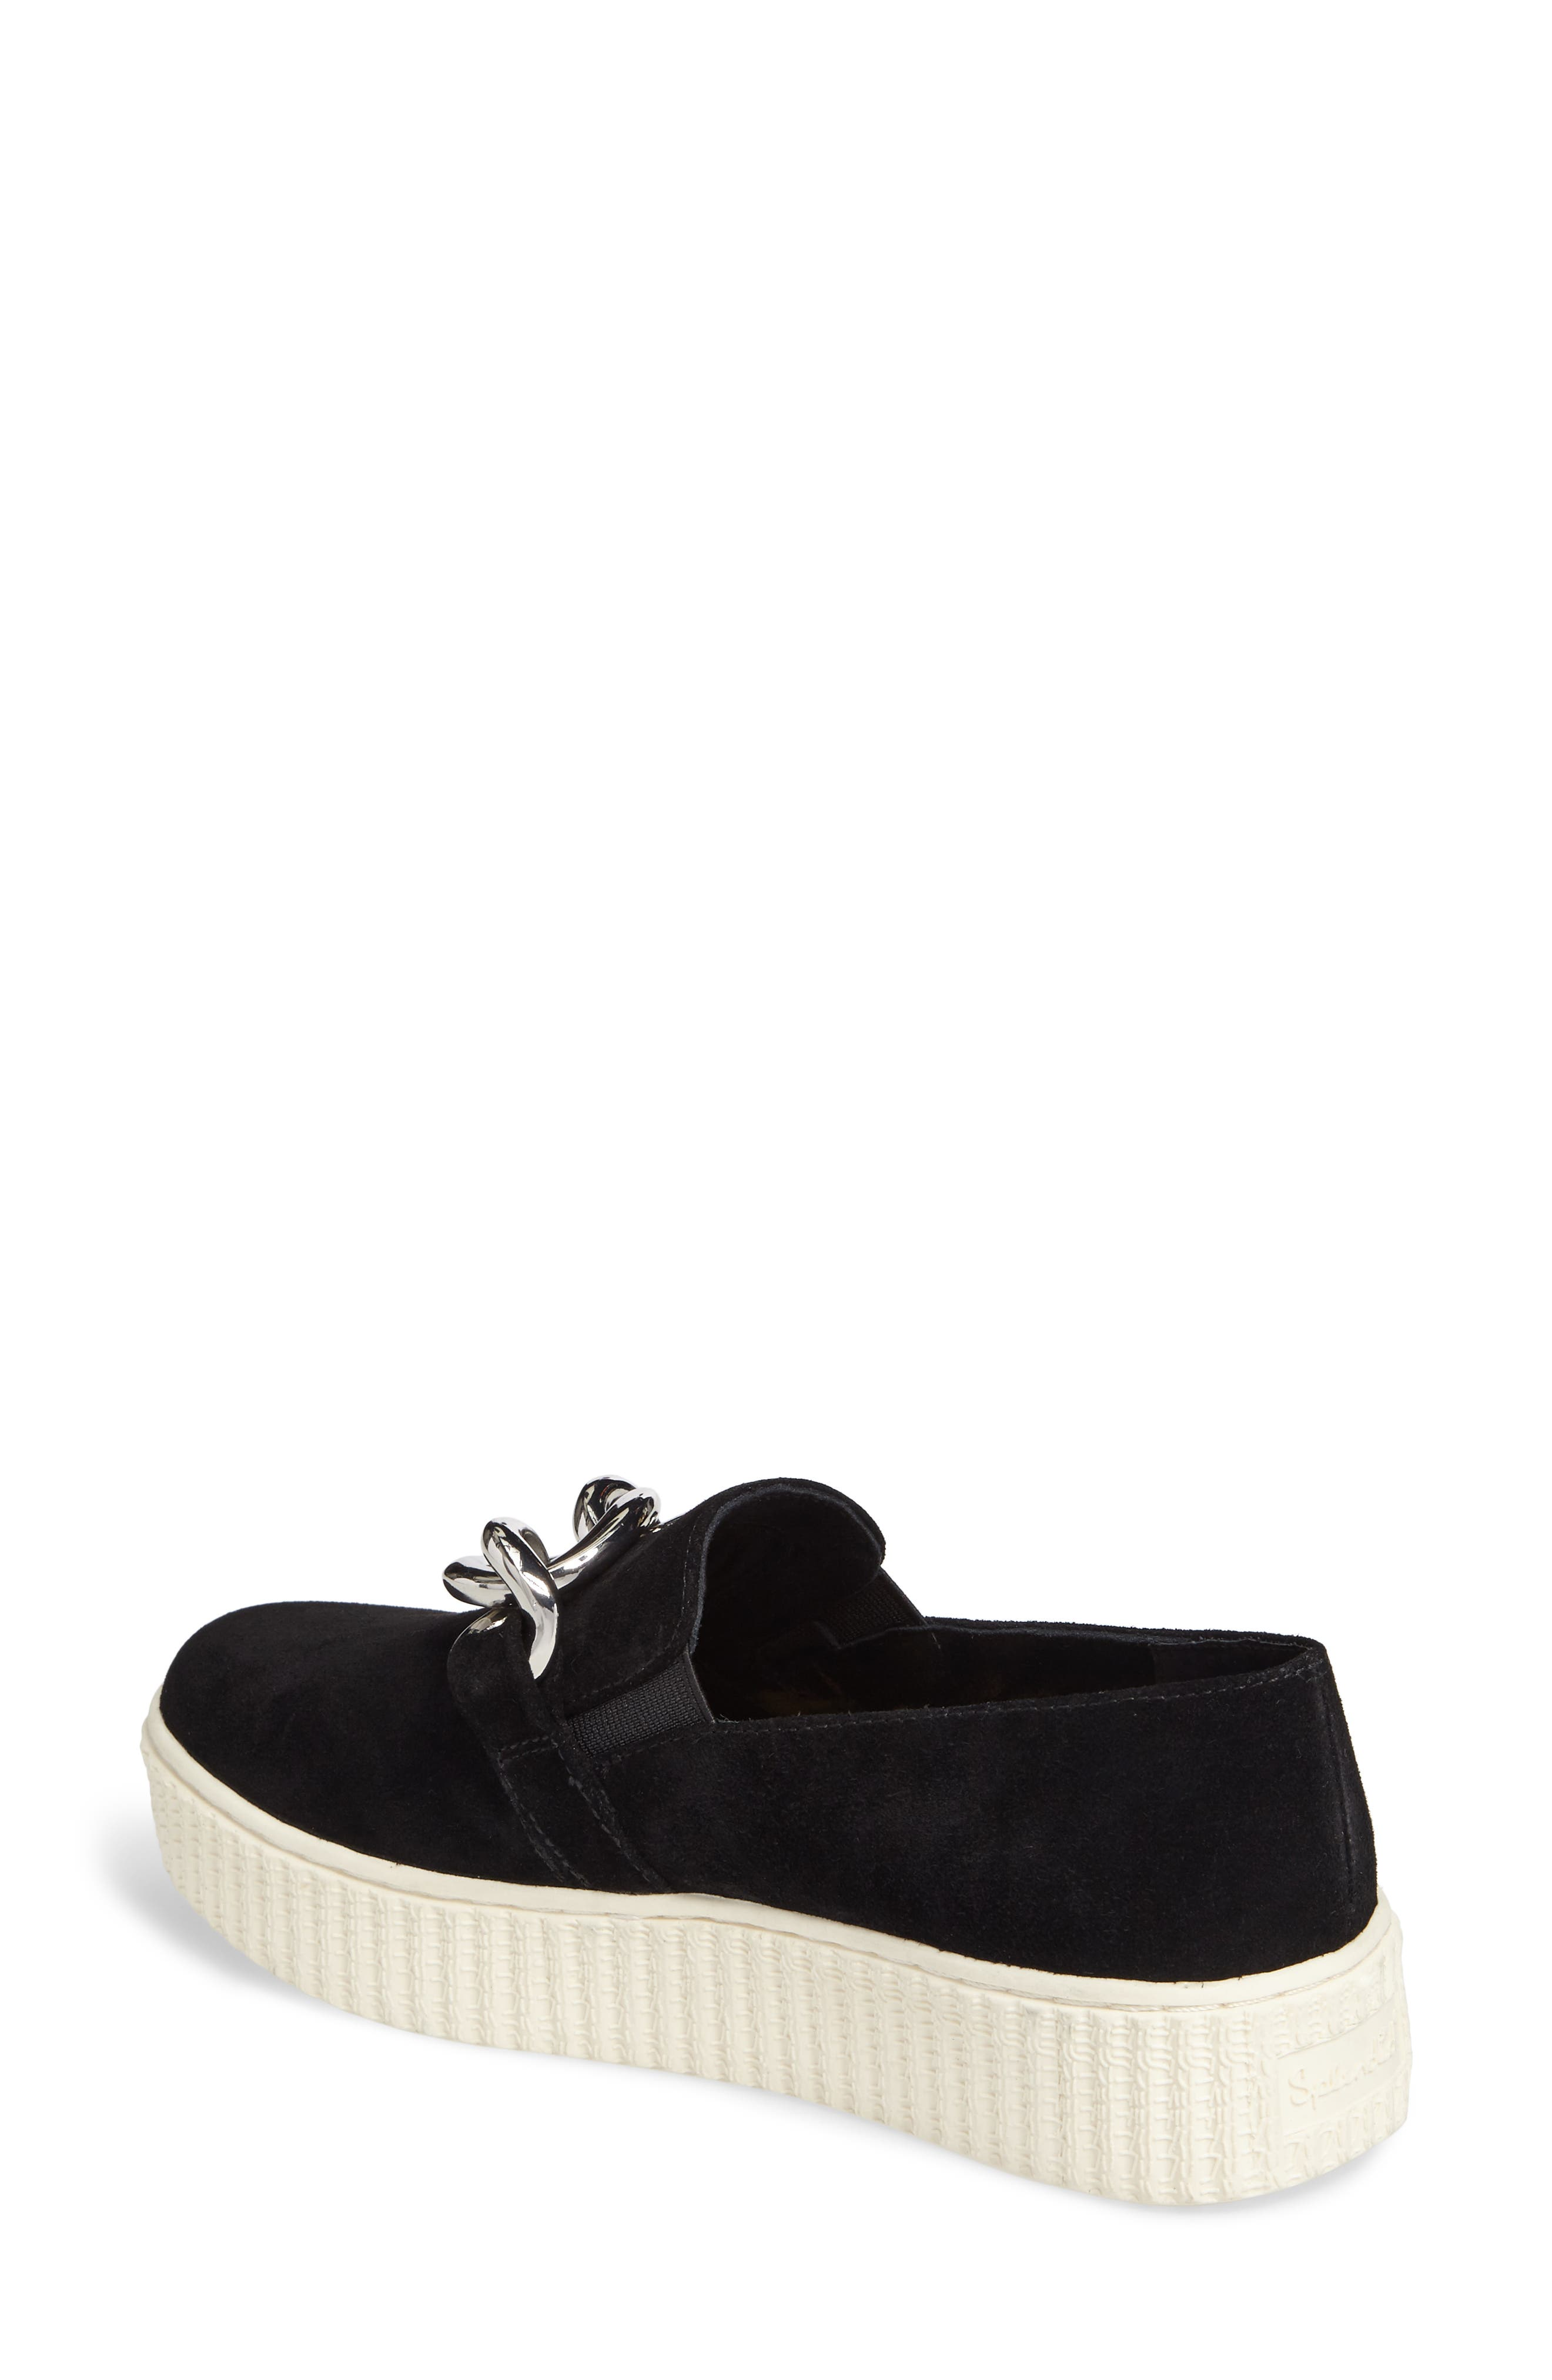 Roberta Platform Sneaker,                             Alternate thumbnail 2, color,                             Black Suede